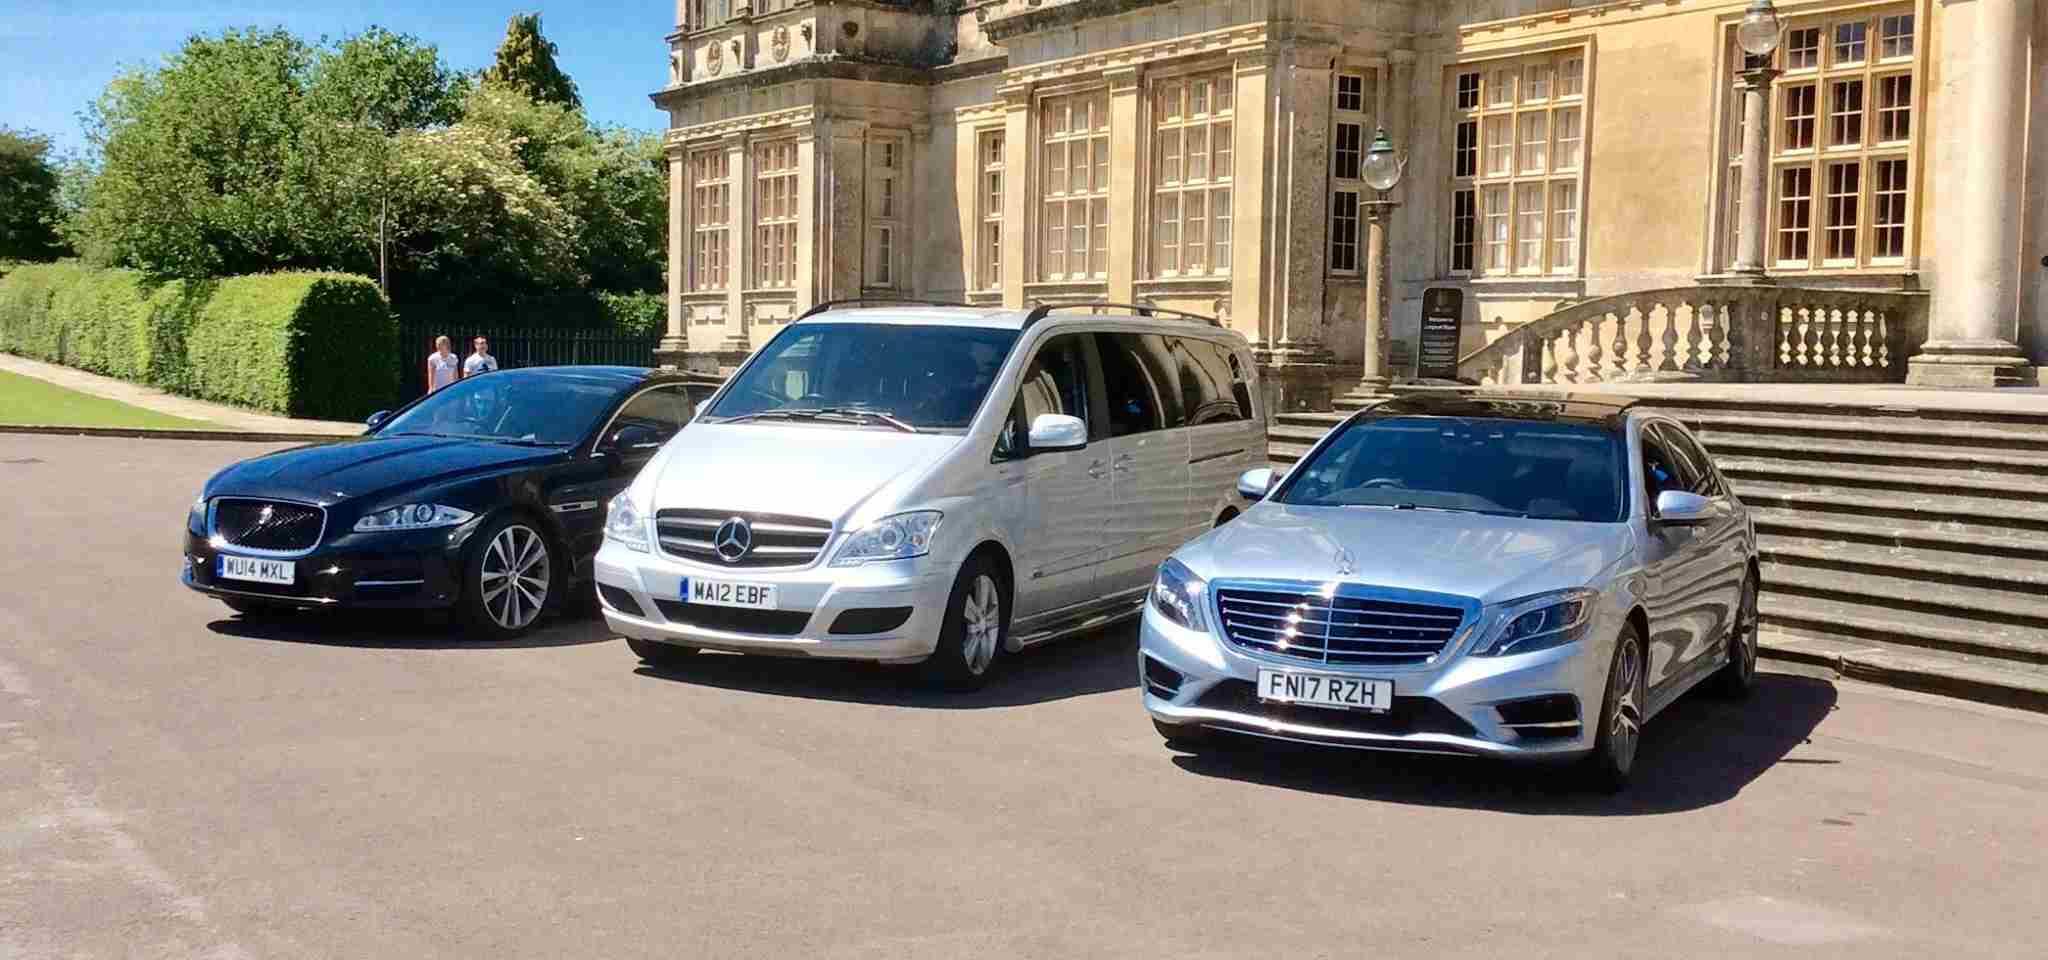 Bath Taxi Transfers vehicles